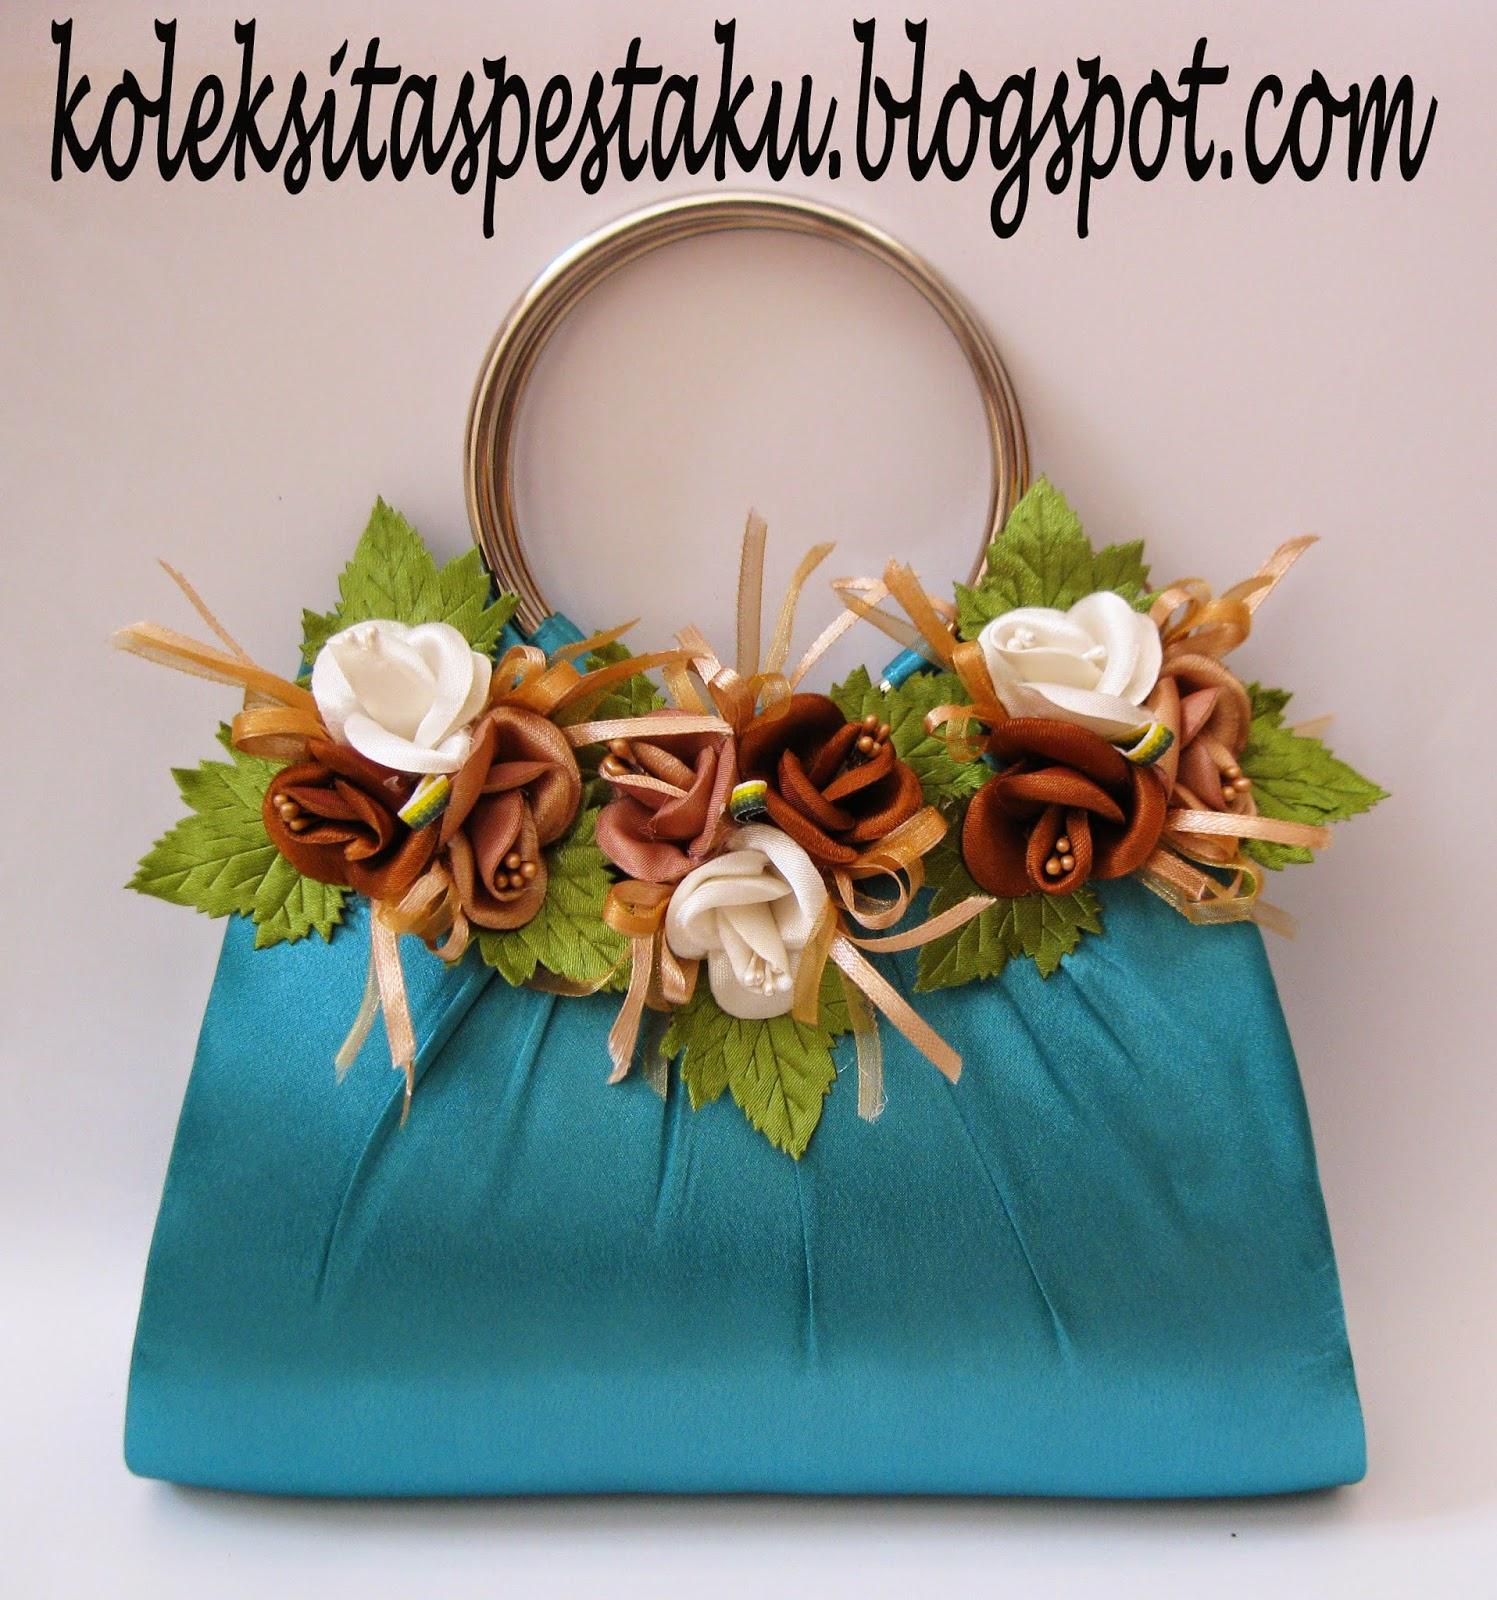 Tas Pesta Tosca dengan Bunga Cantik Coklat